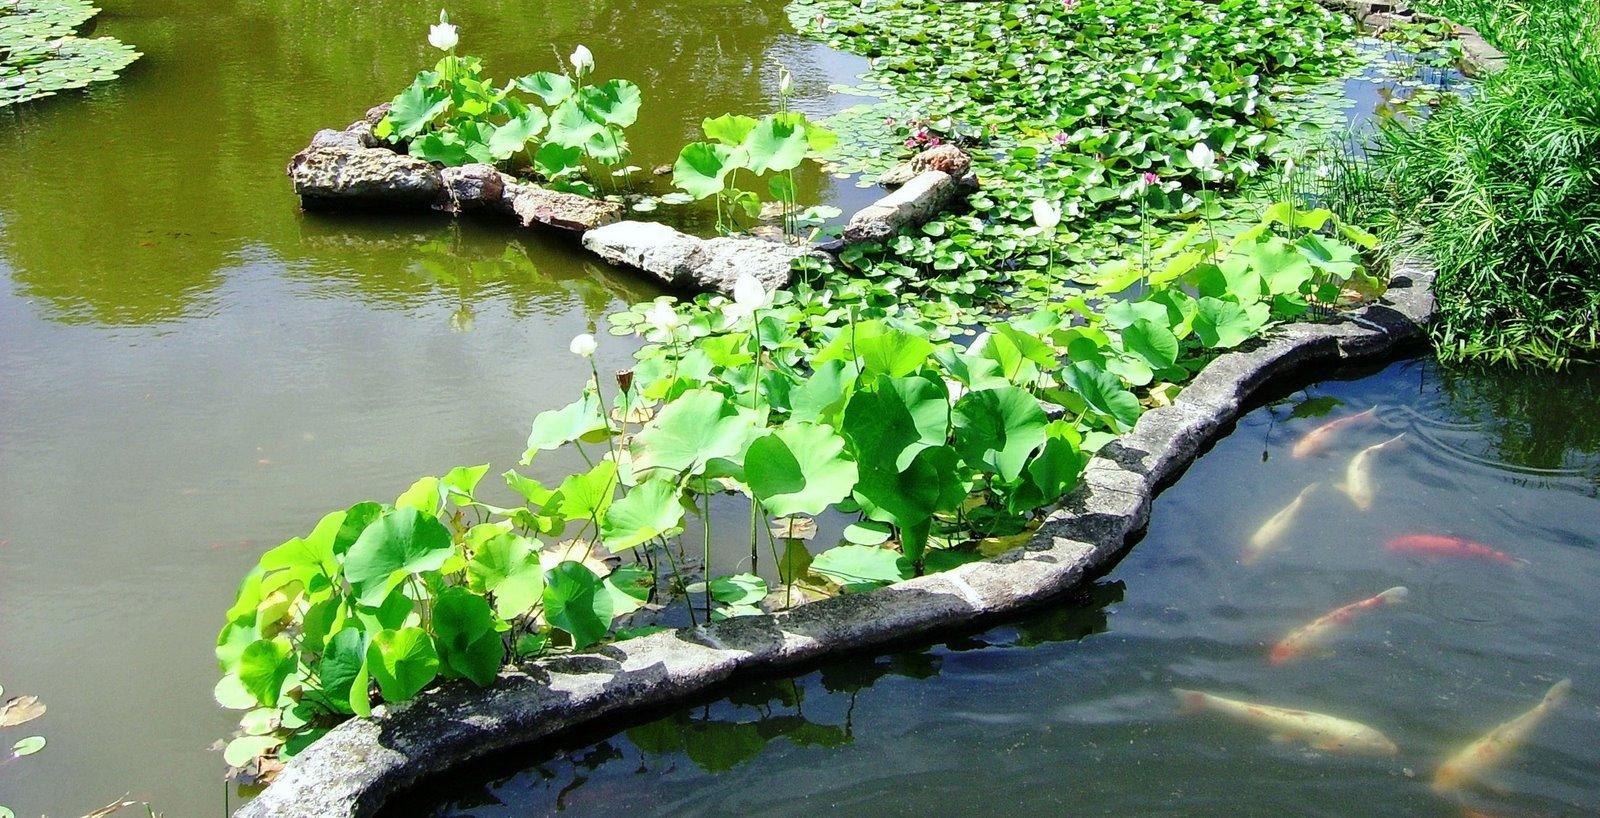 Kj kaye and jose amazing photos waterlilies around for Koi fish pond sydney